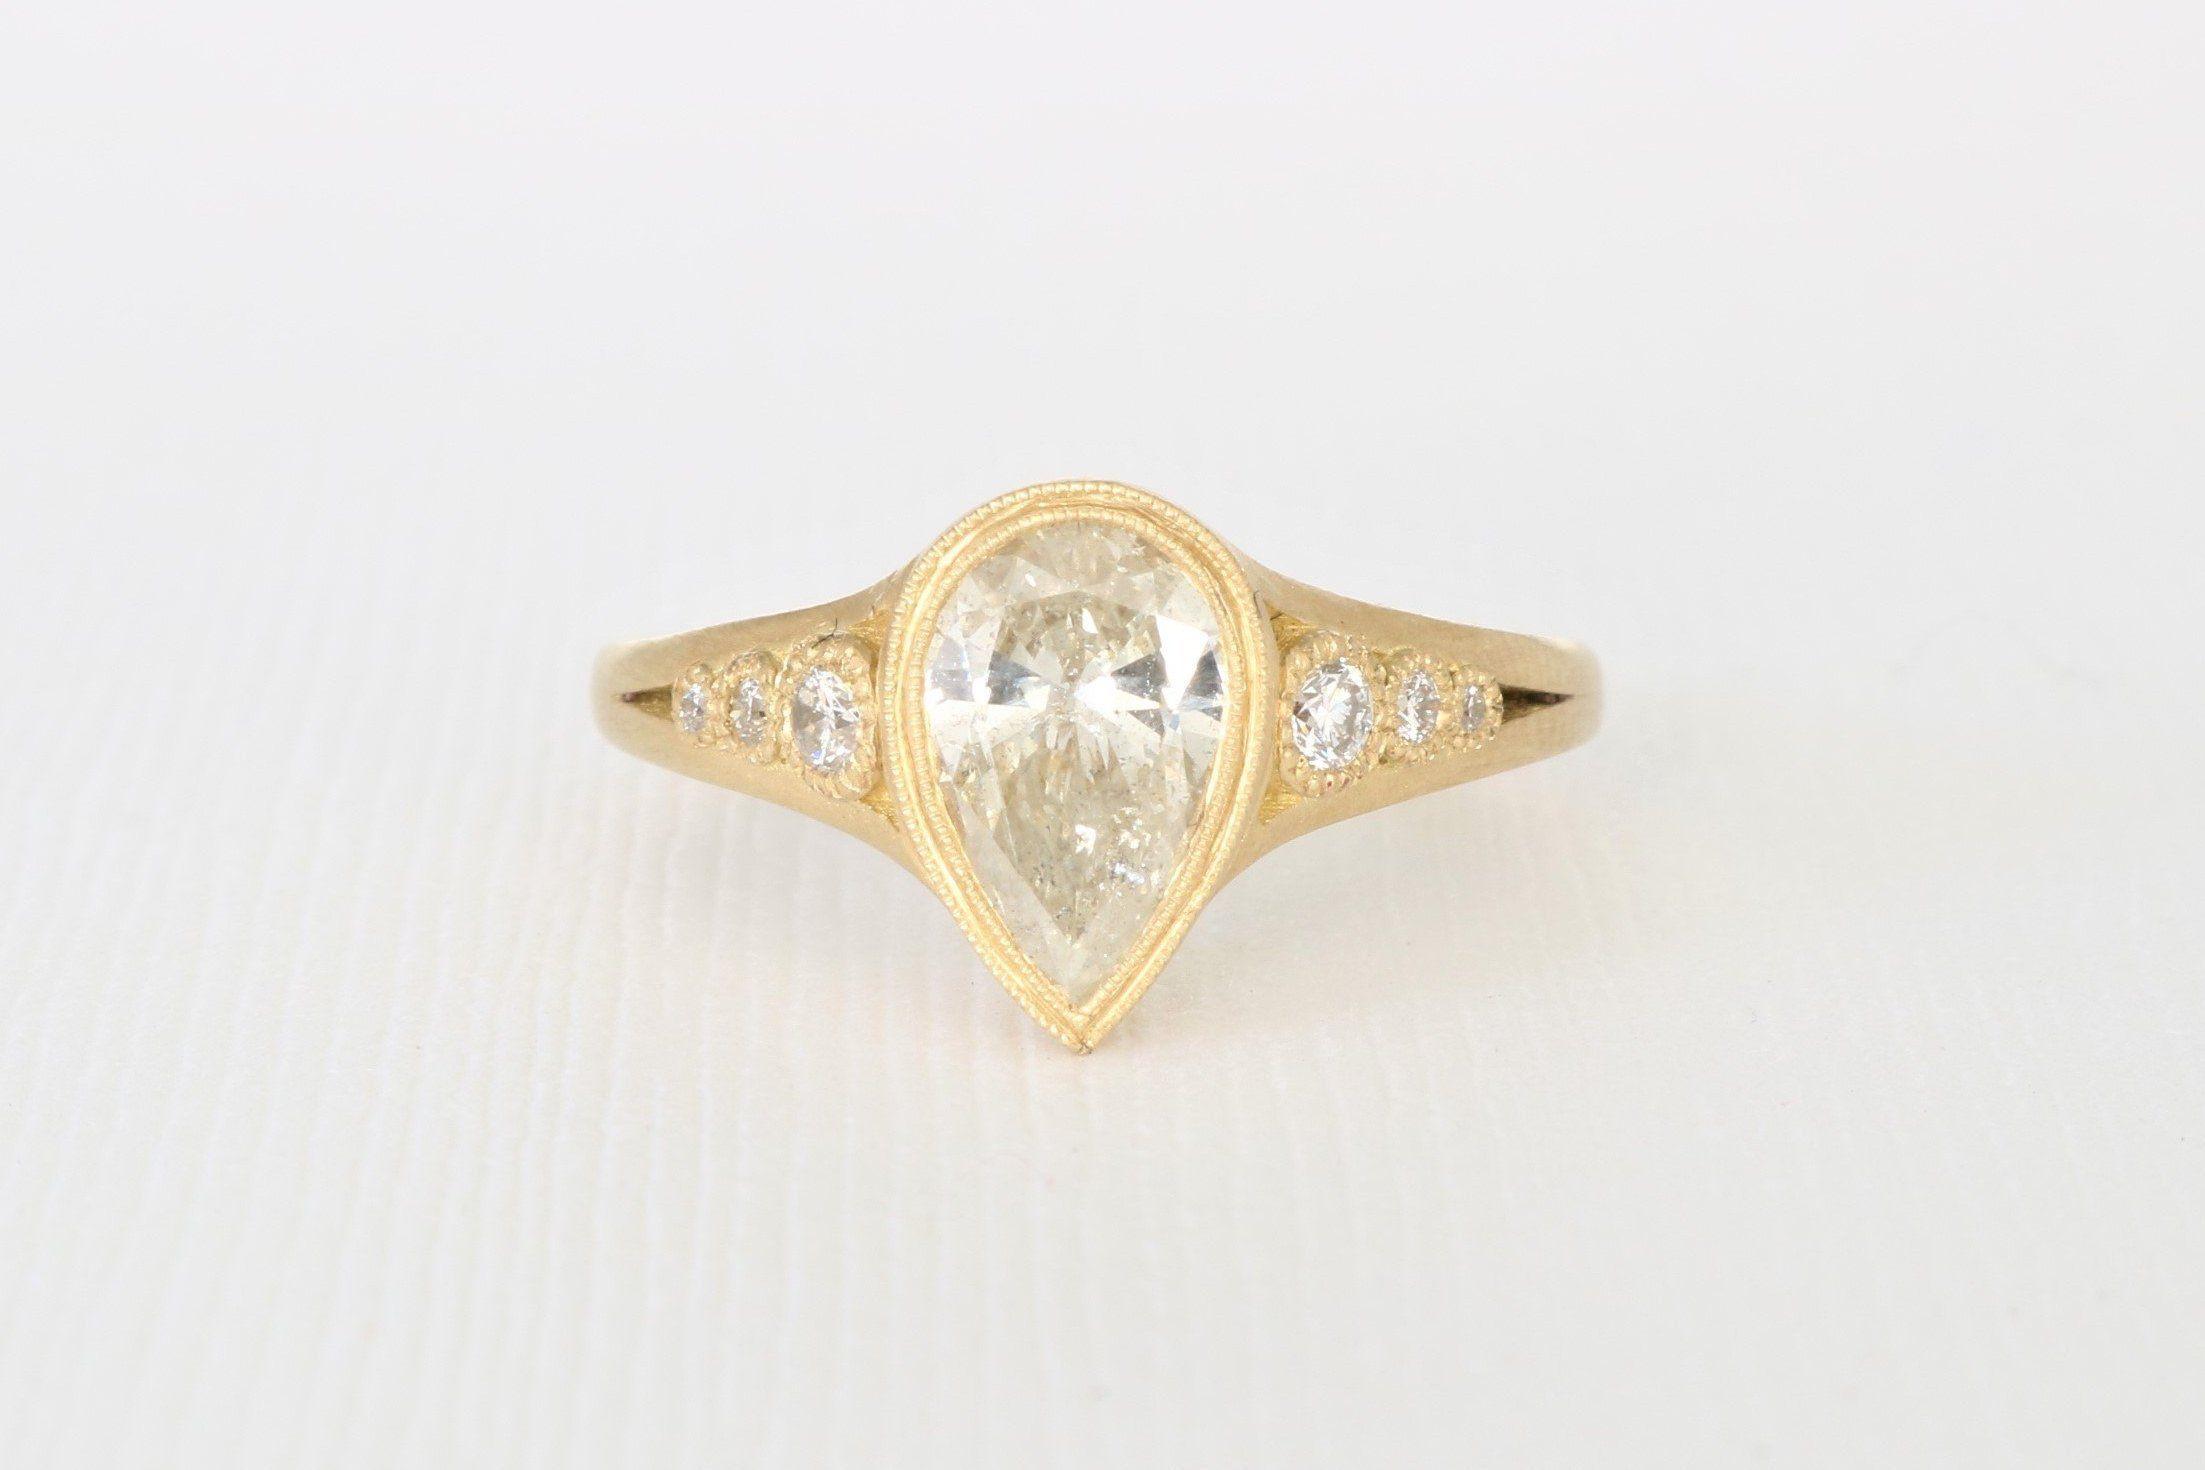 Hand milgrained pear cut diamond bezel ring in k yellow gold